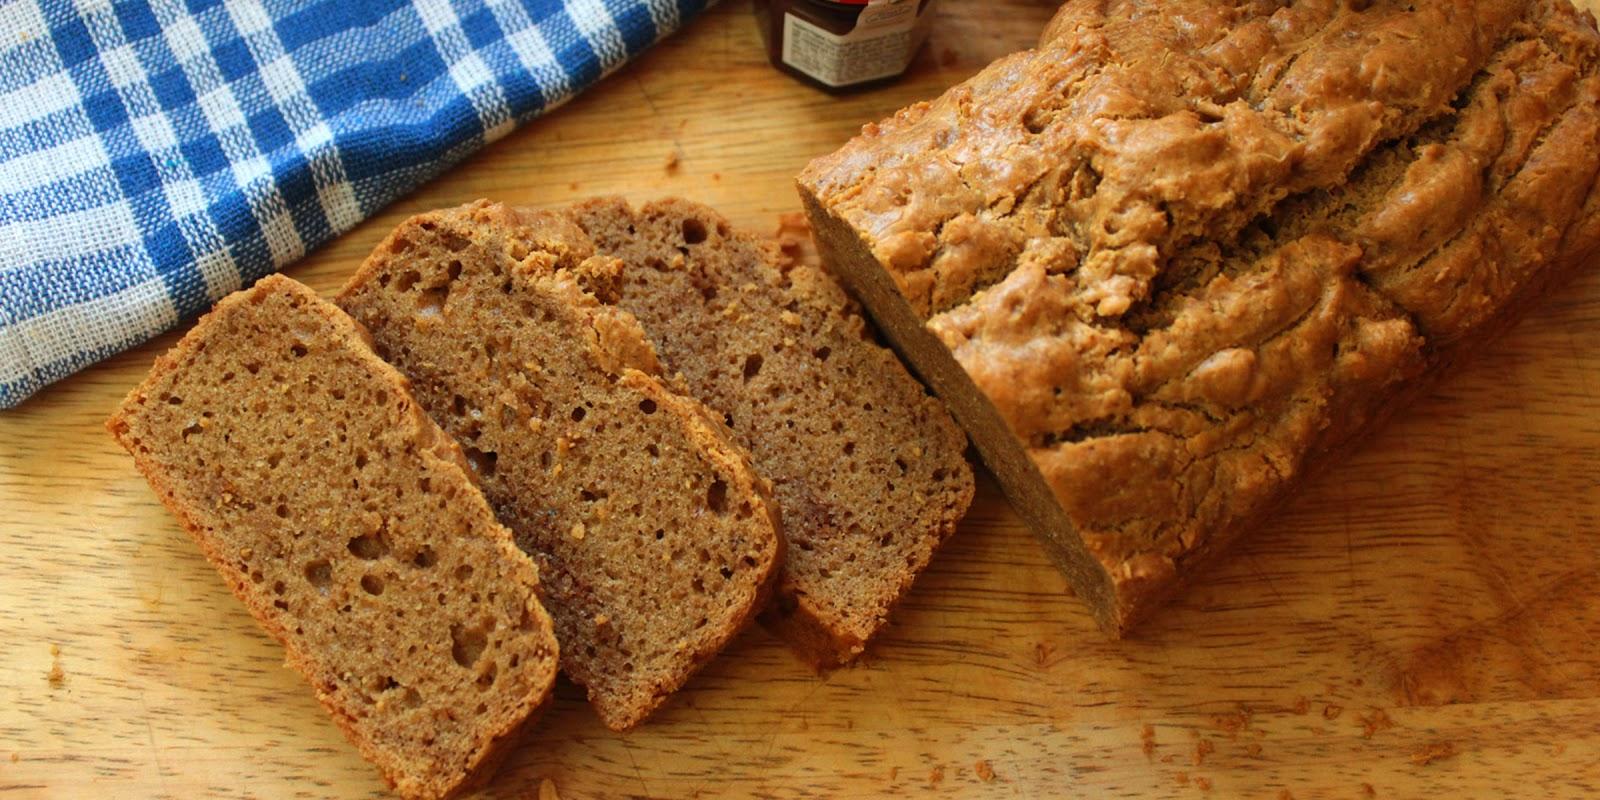 Keto Peanut Butter Bread - TODAY.com